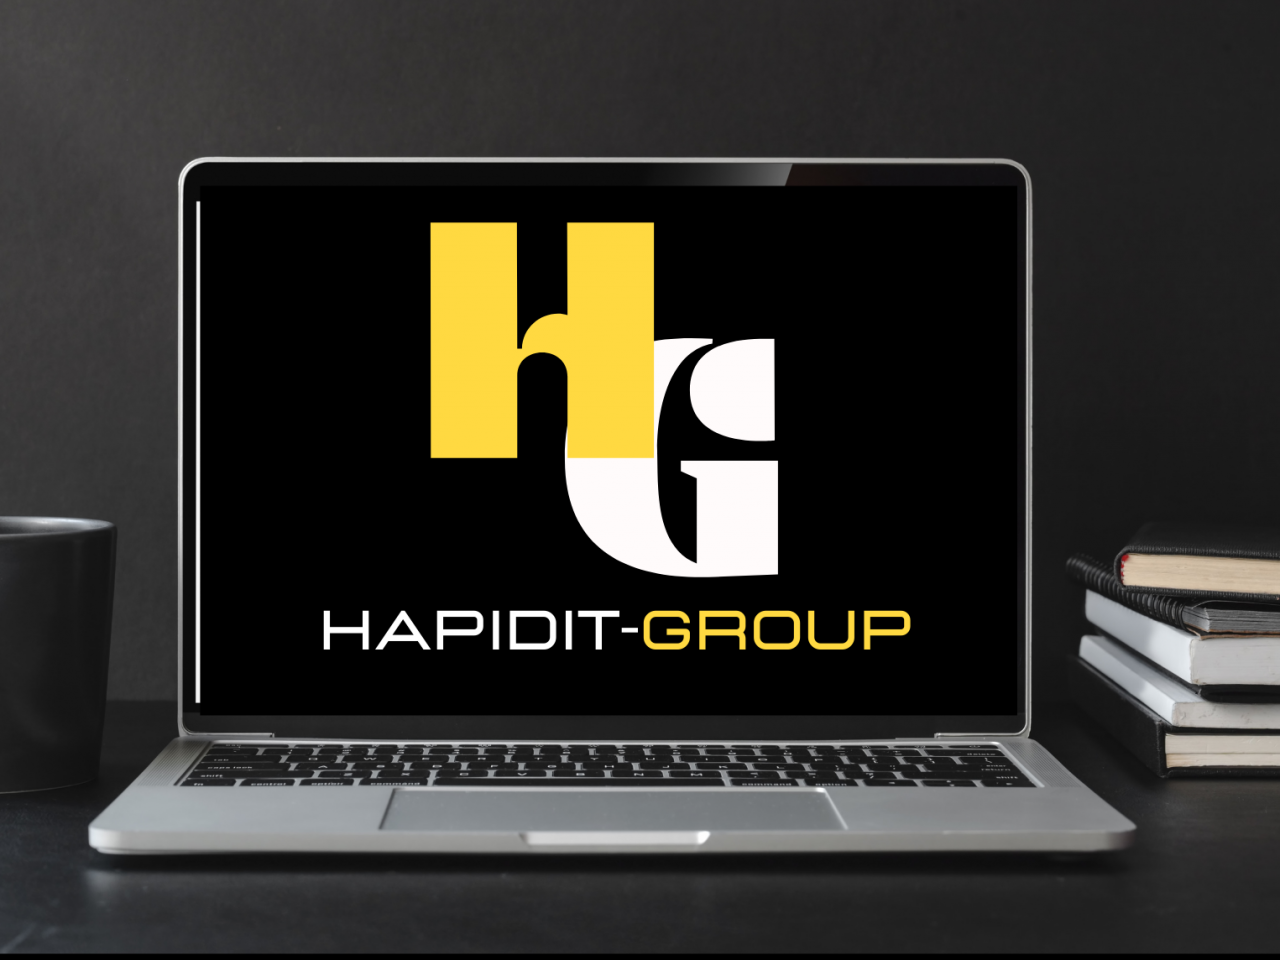 https://hapiditgroup.co/wp-content/uploads/2021/03/digital-1280x960.png